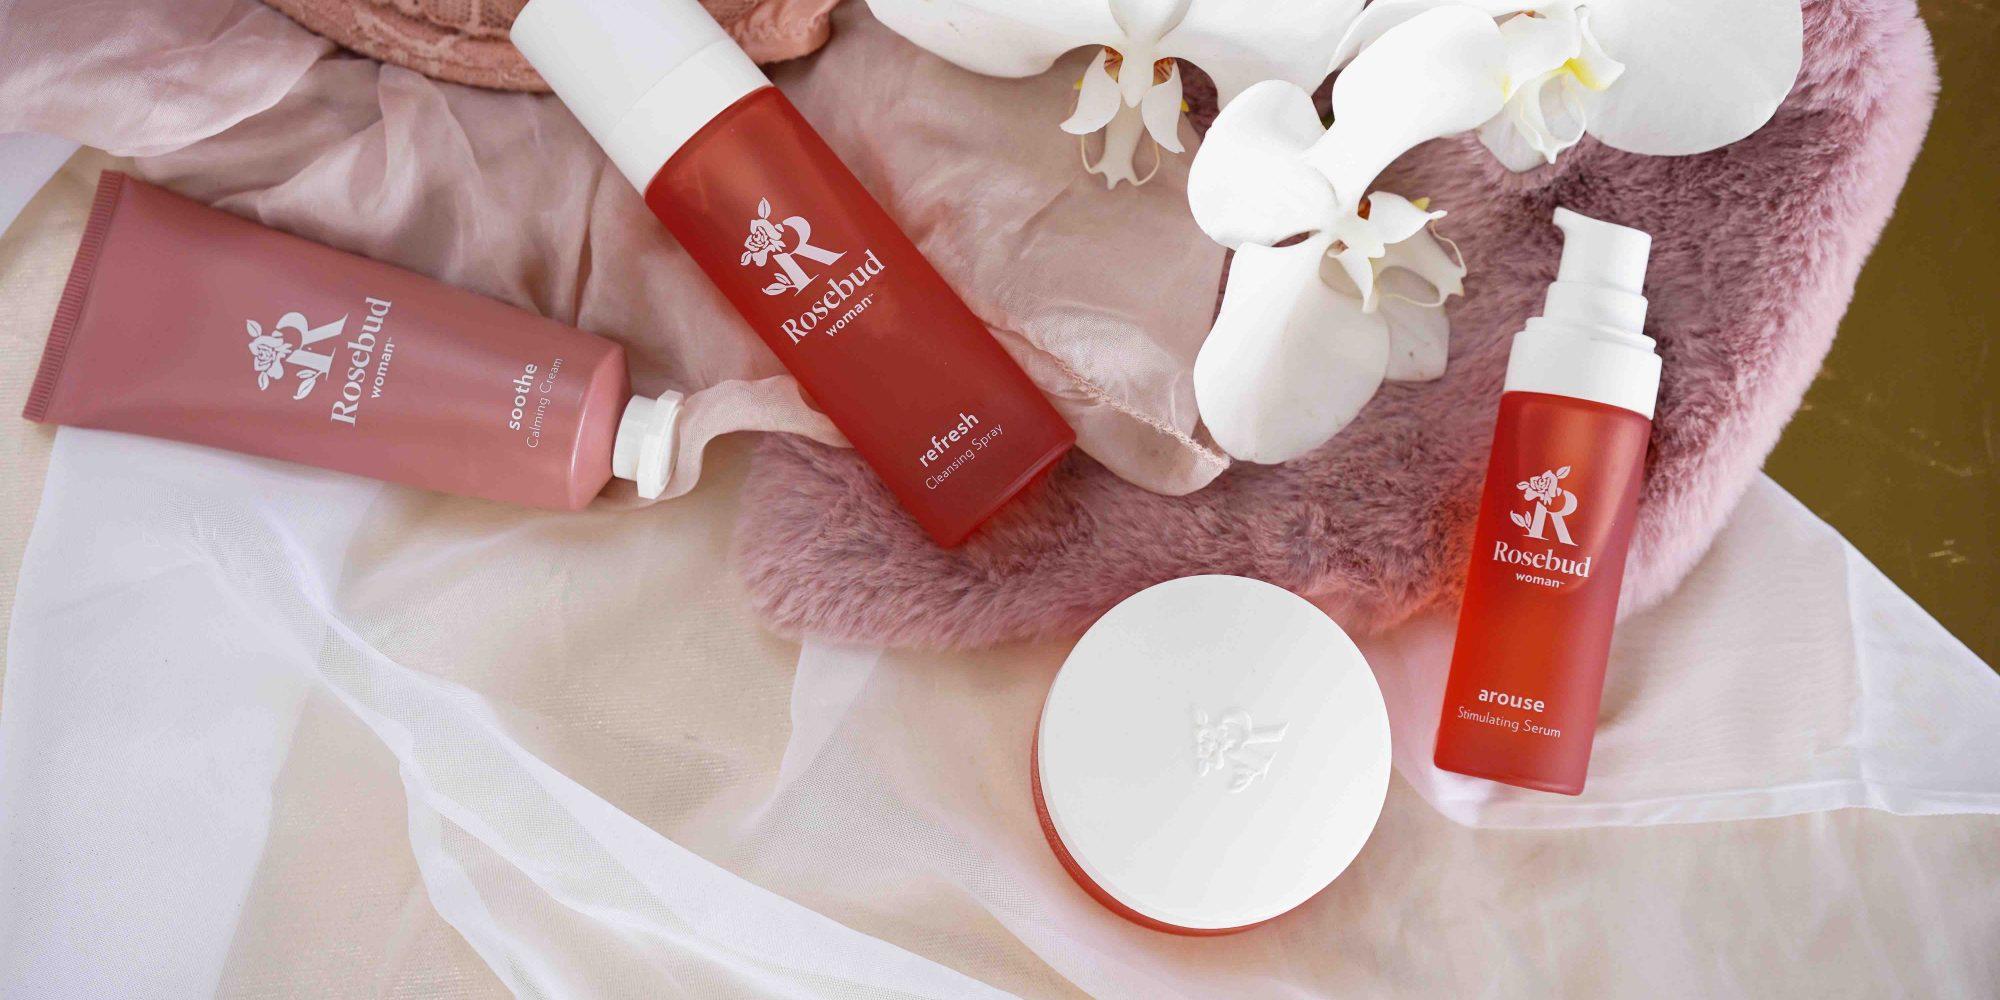 New Brand Rosebud Woman Is The Woke La Mer Of Intimate Skincare